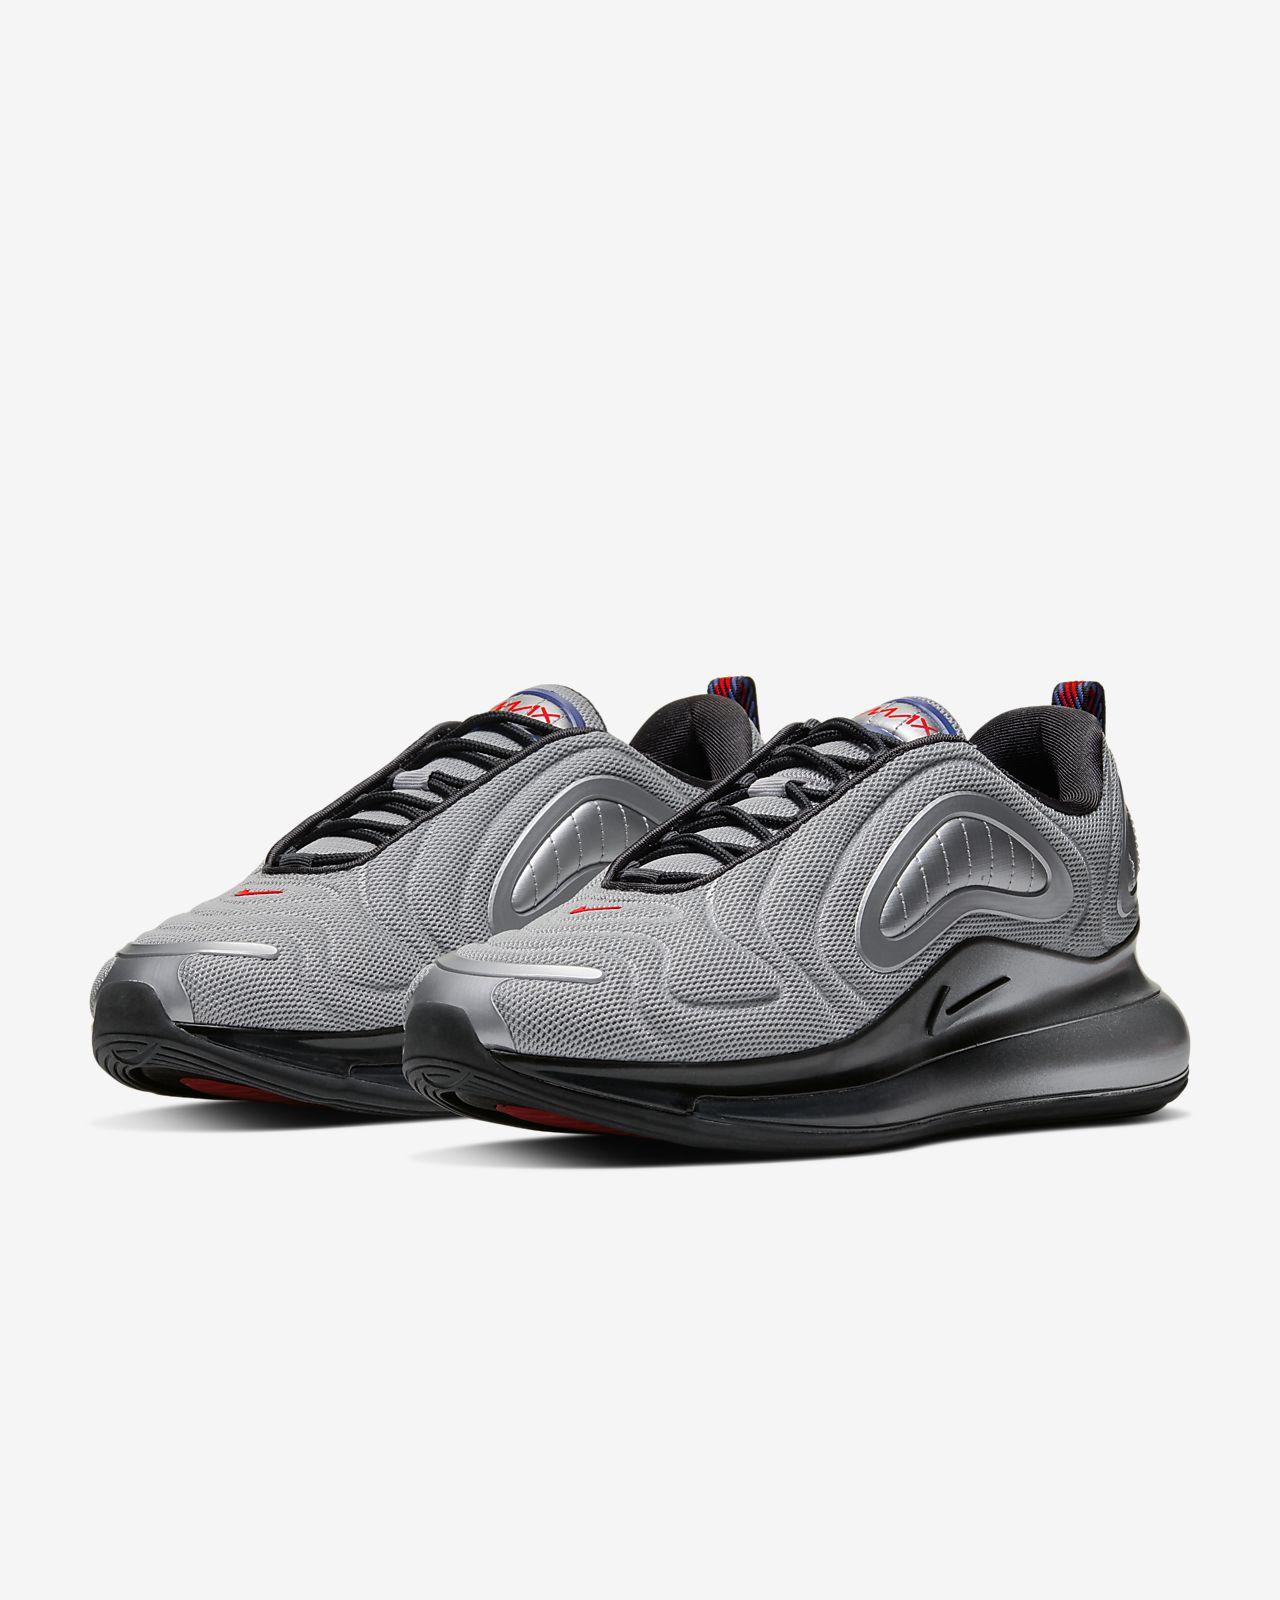 Sapatilhas casual de homem Air Max 720 Nike